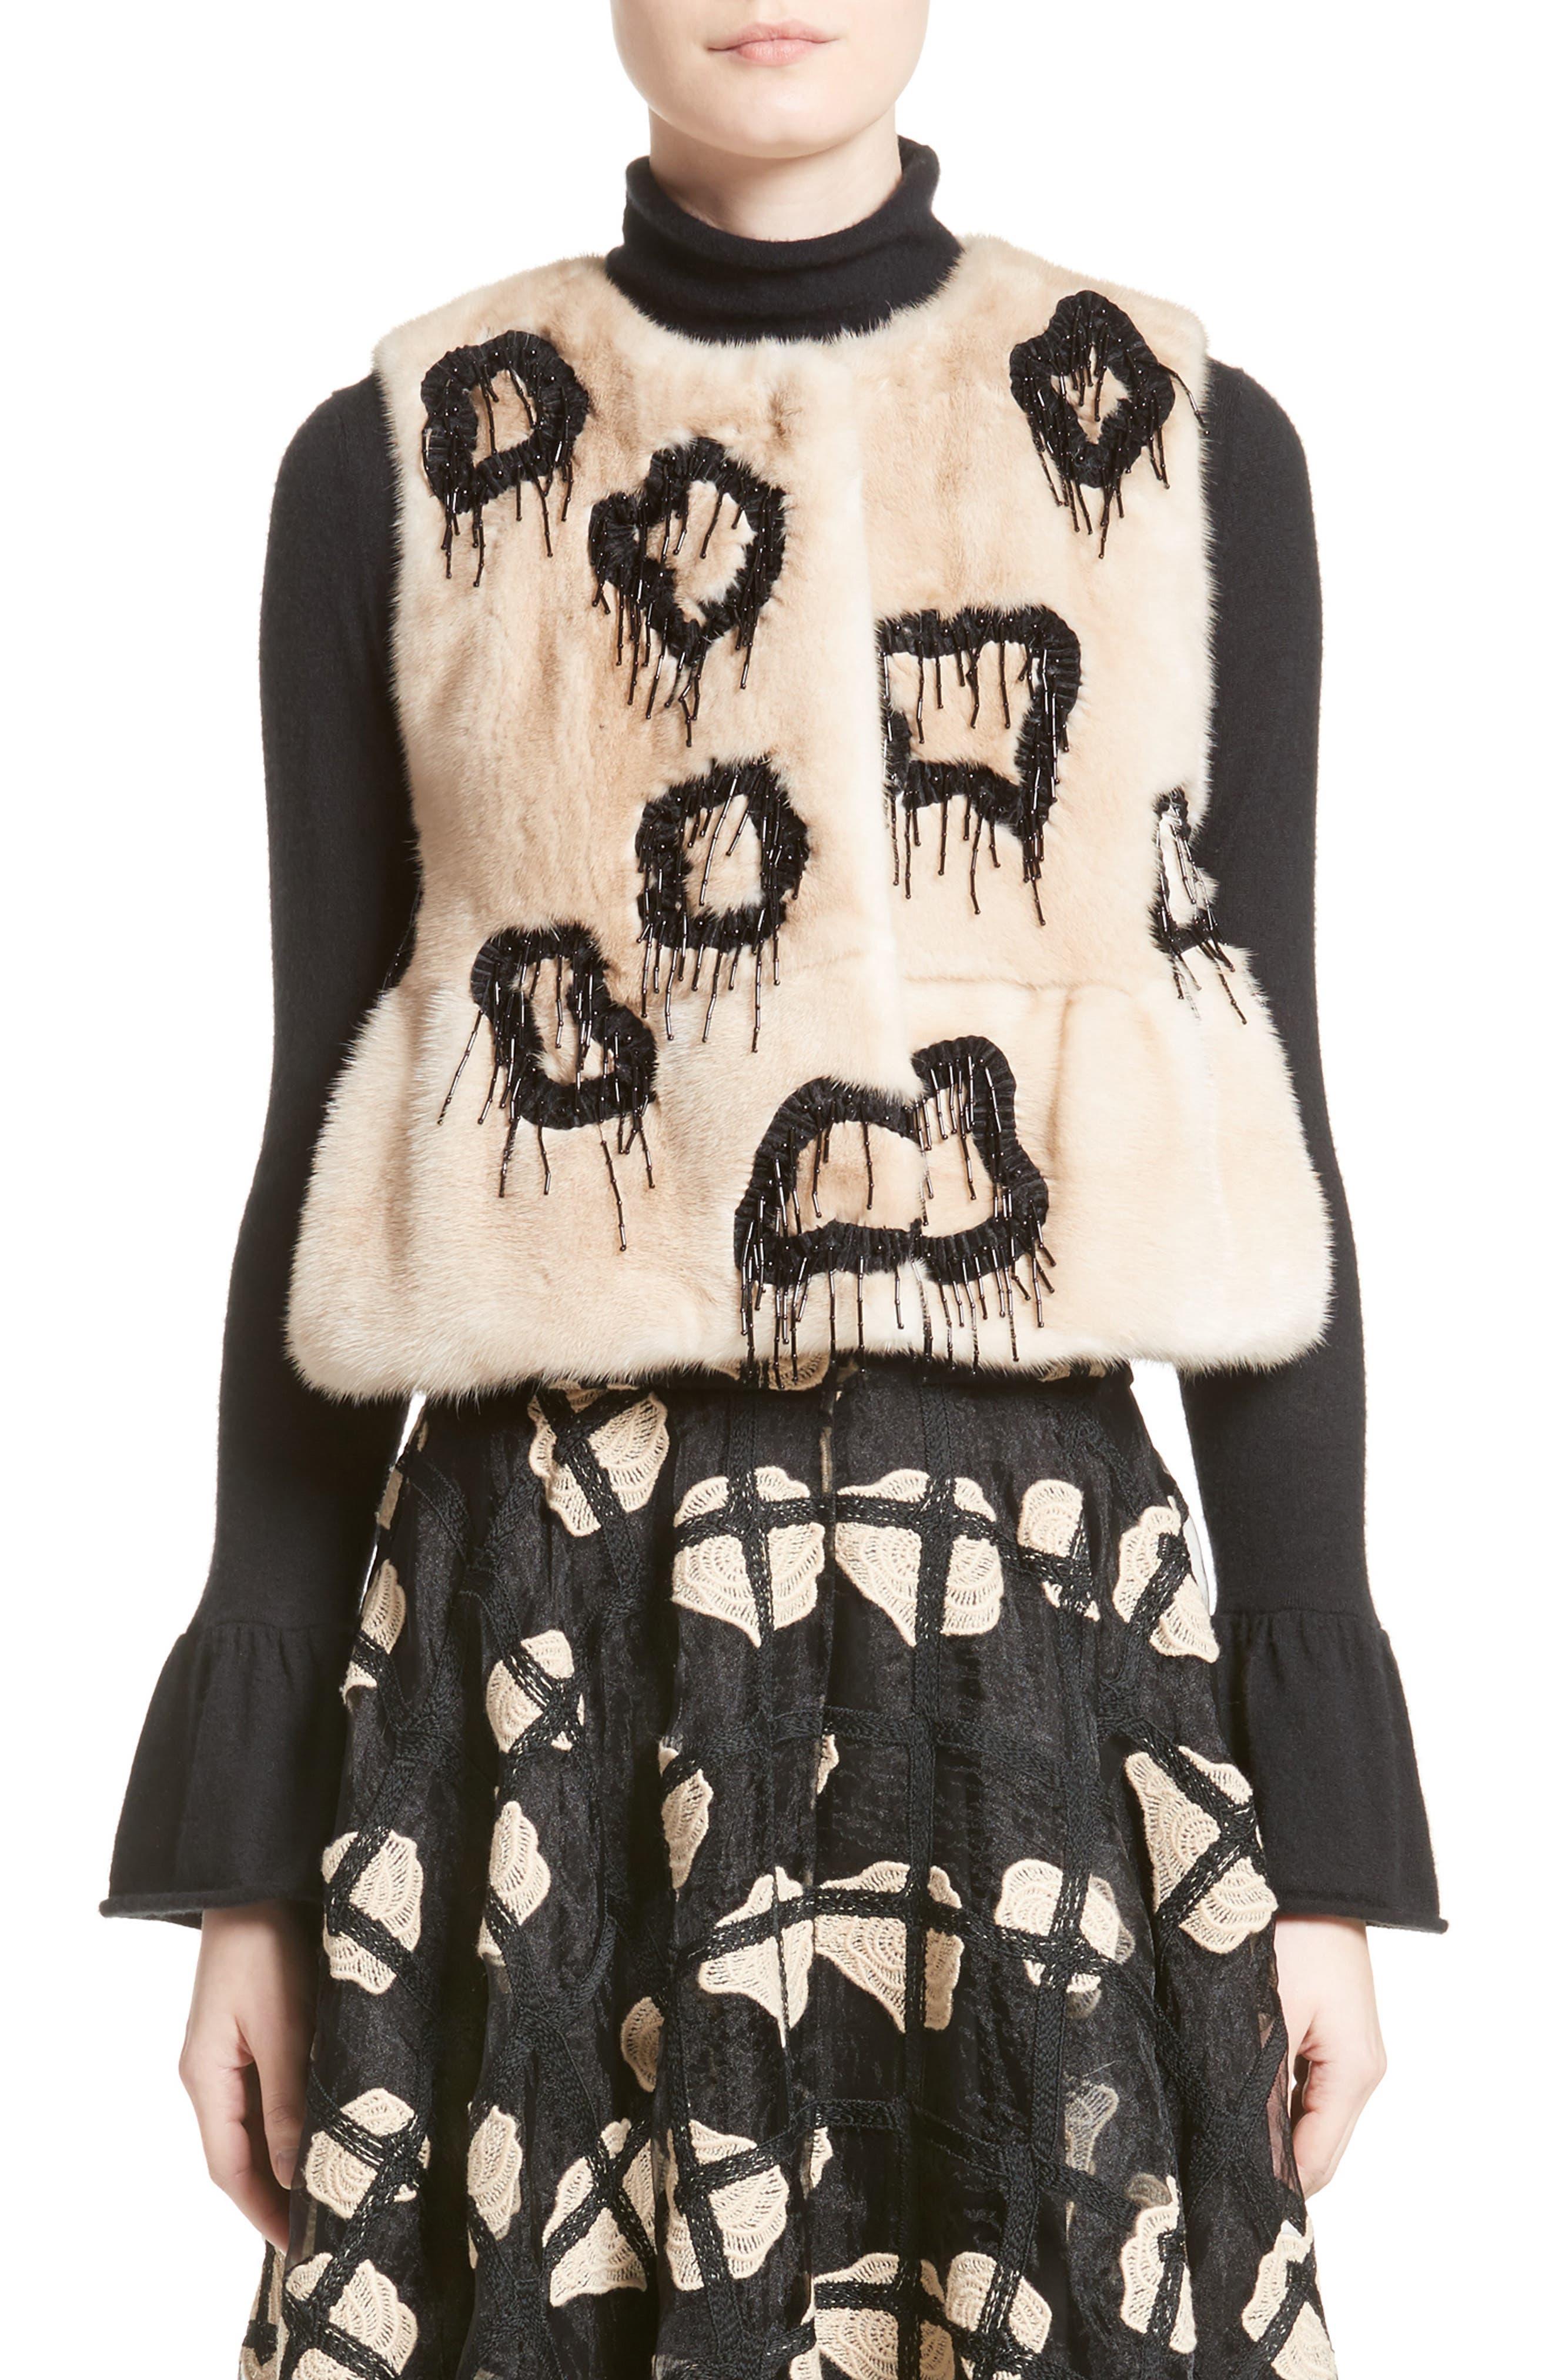 Co Beaded Genuine Mink Fur Peplum Vest